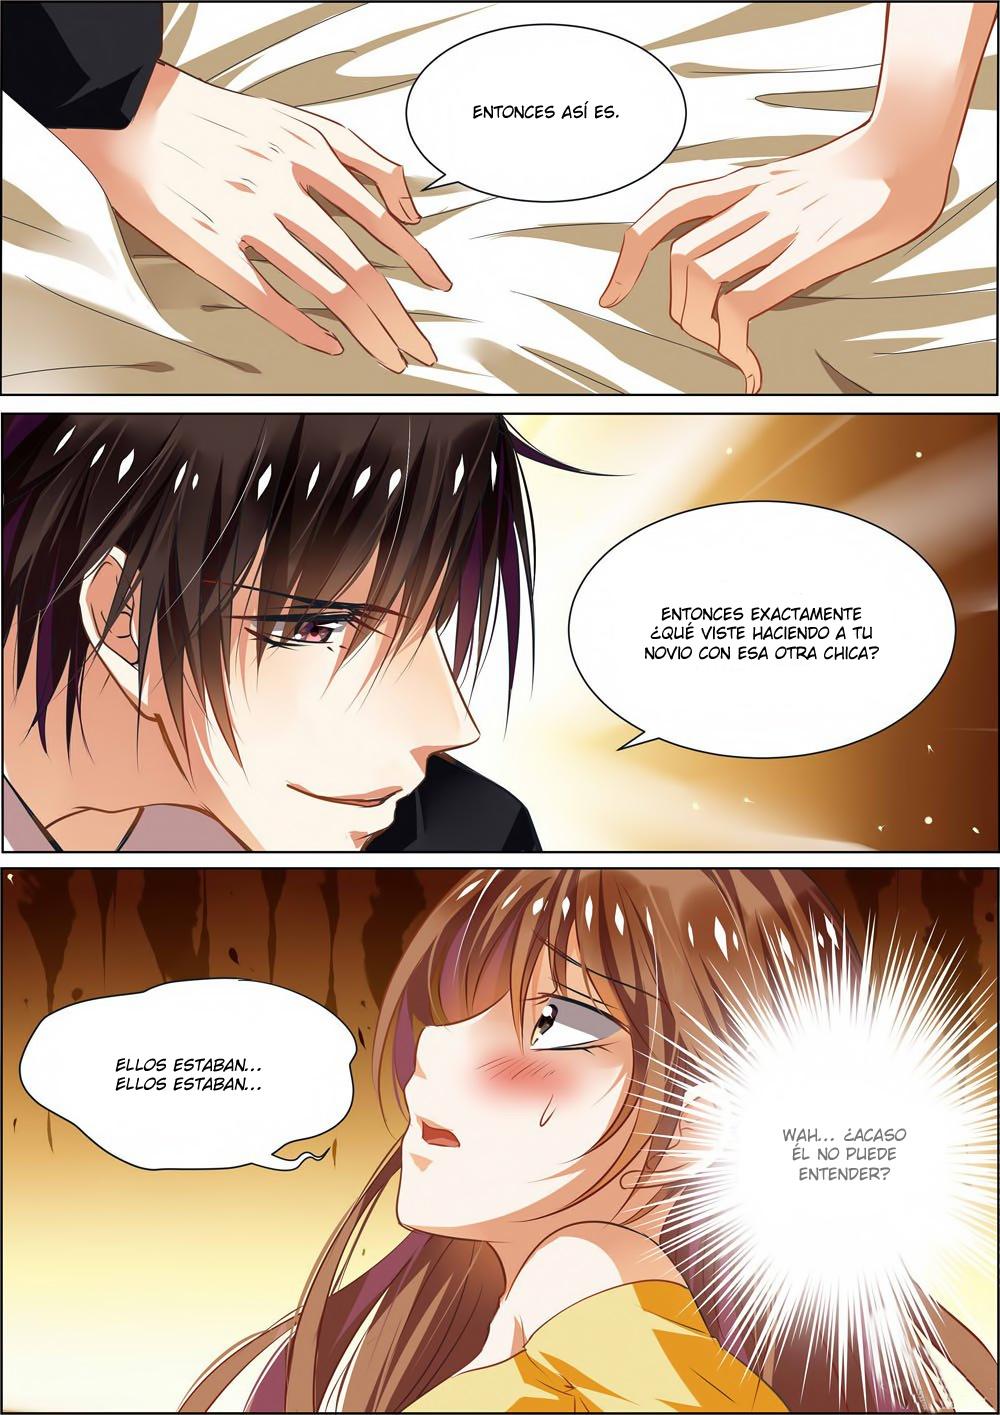 http://c5.ninemanga.com/es_manga/5/16069/395470/bafecb7be9c75e90fbda452f8729d860.jpg Page 3